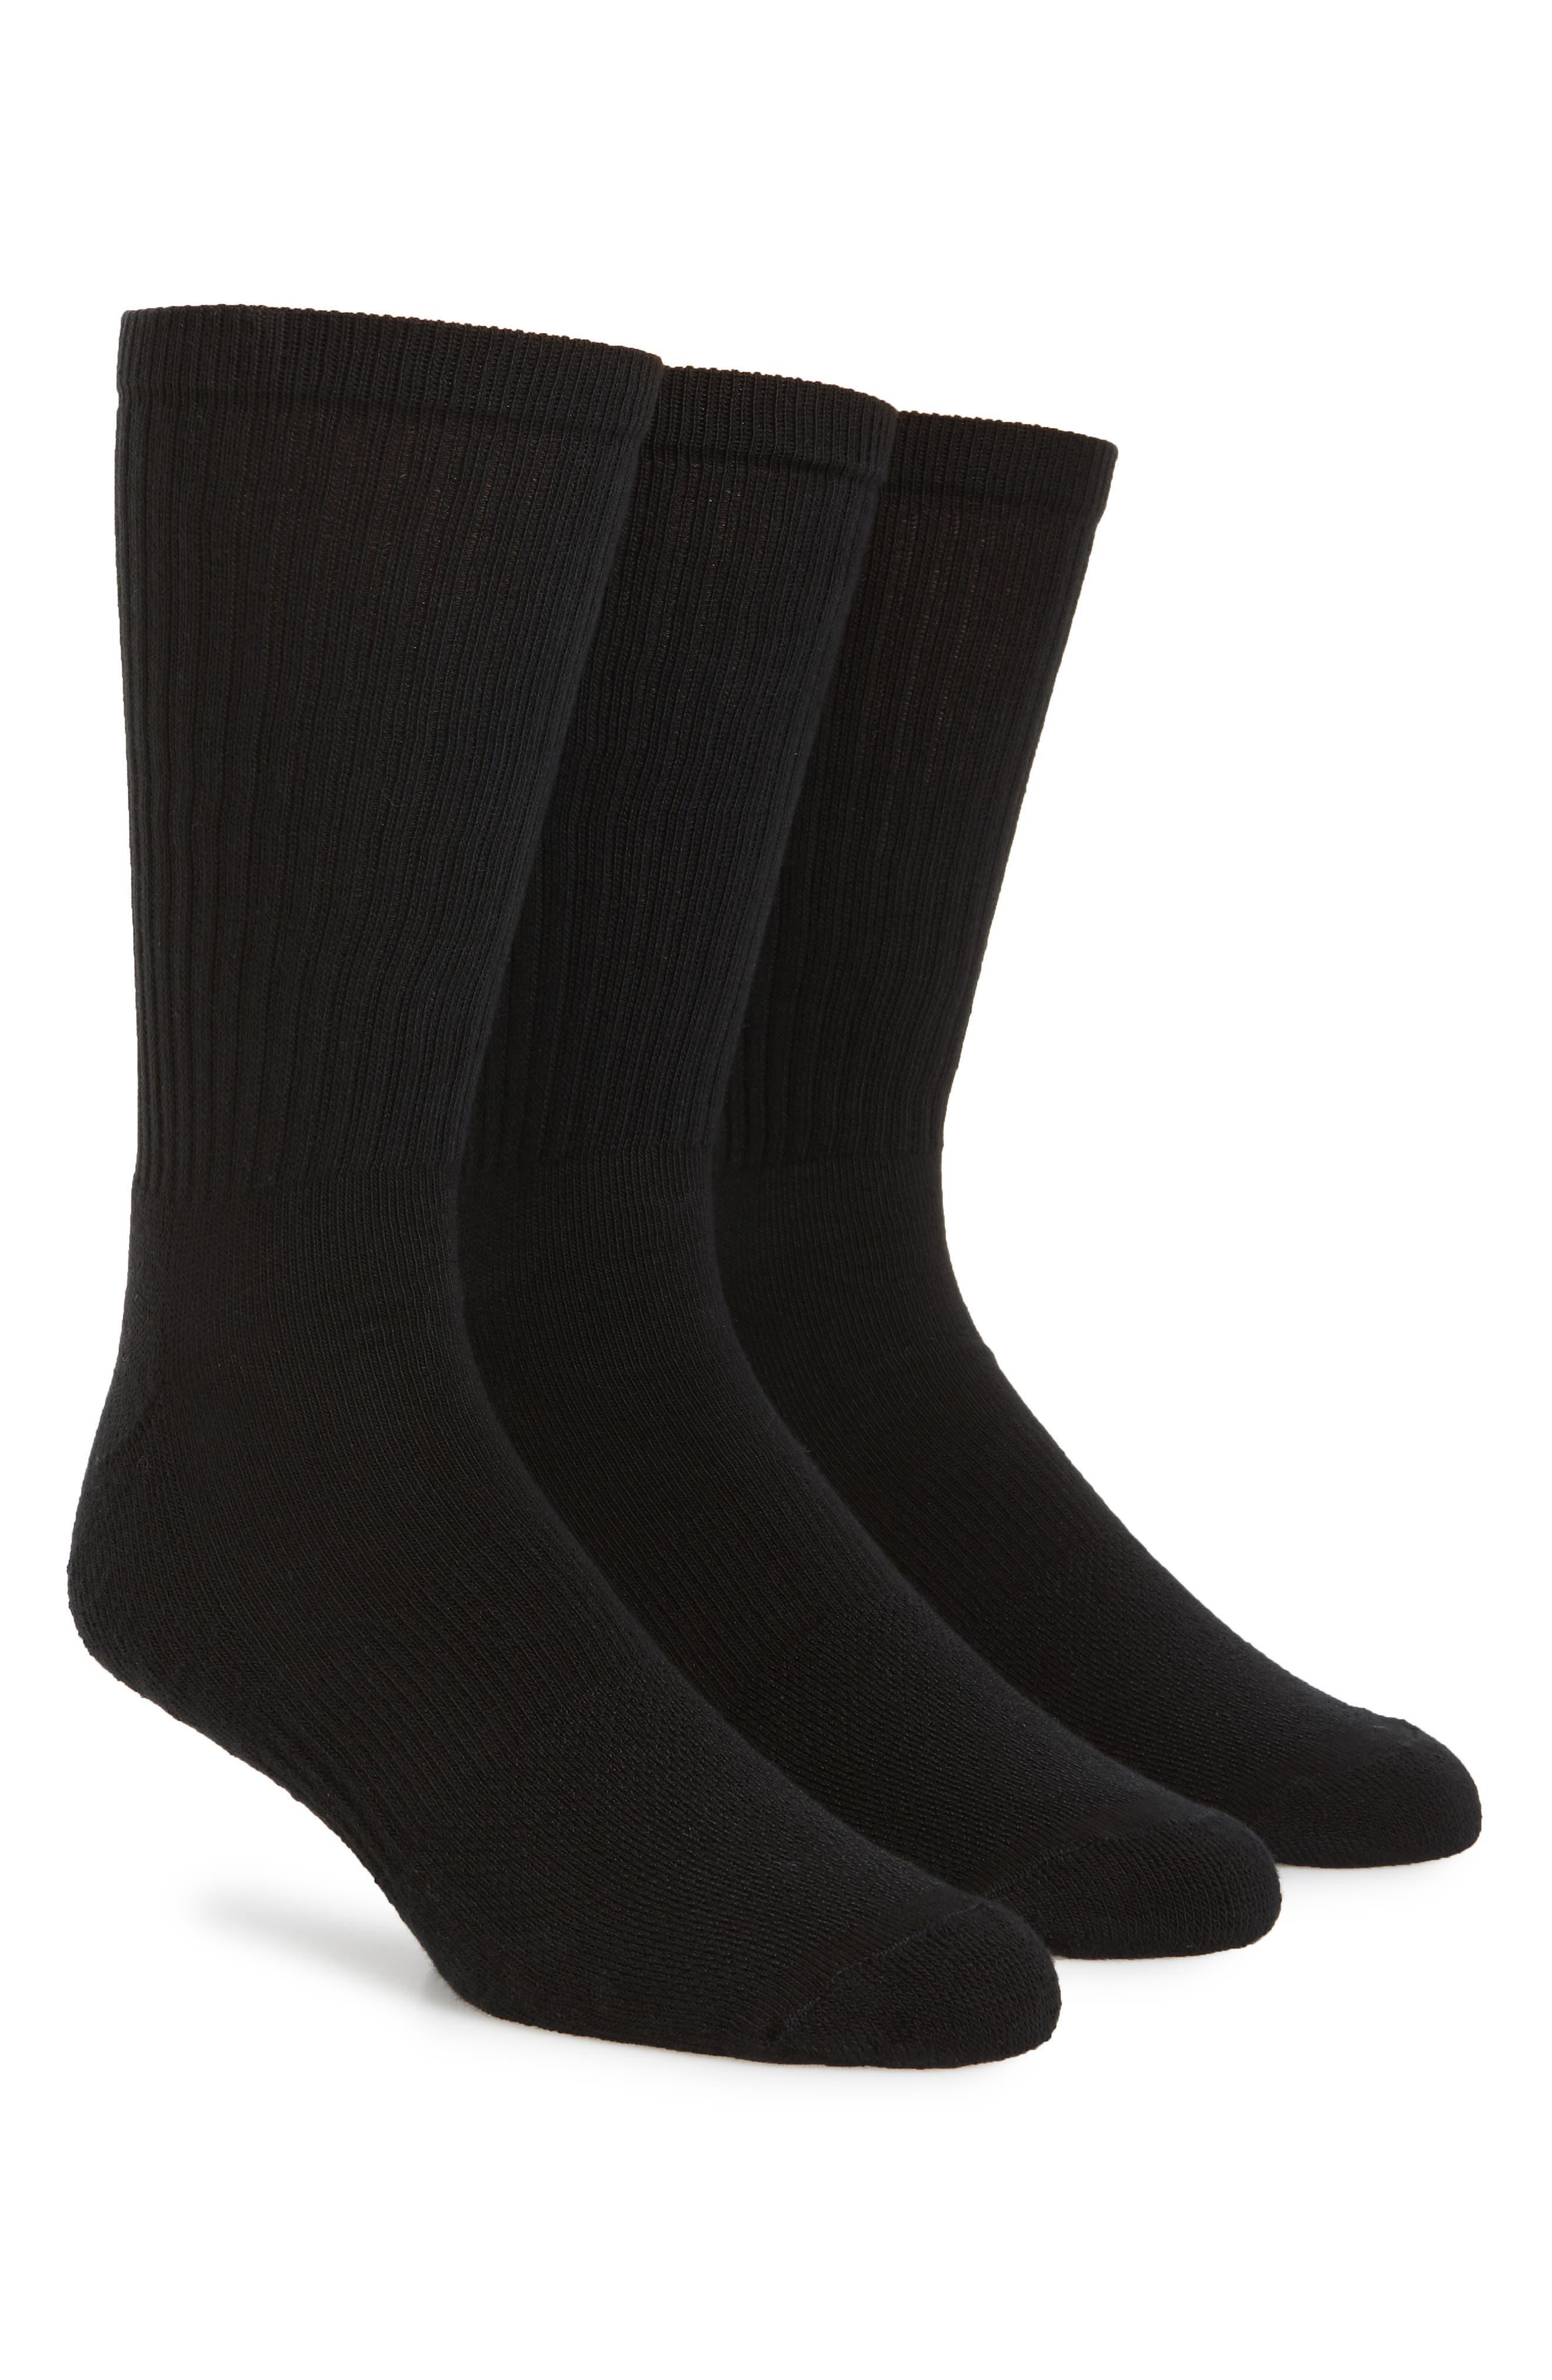 NORDSTROM MEN'S SHOP, 3-Pack Crew Cut Athletic Socks, Main thumbnail 1, color, BLACK